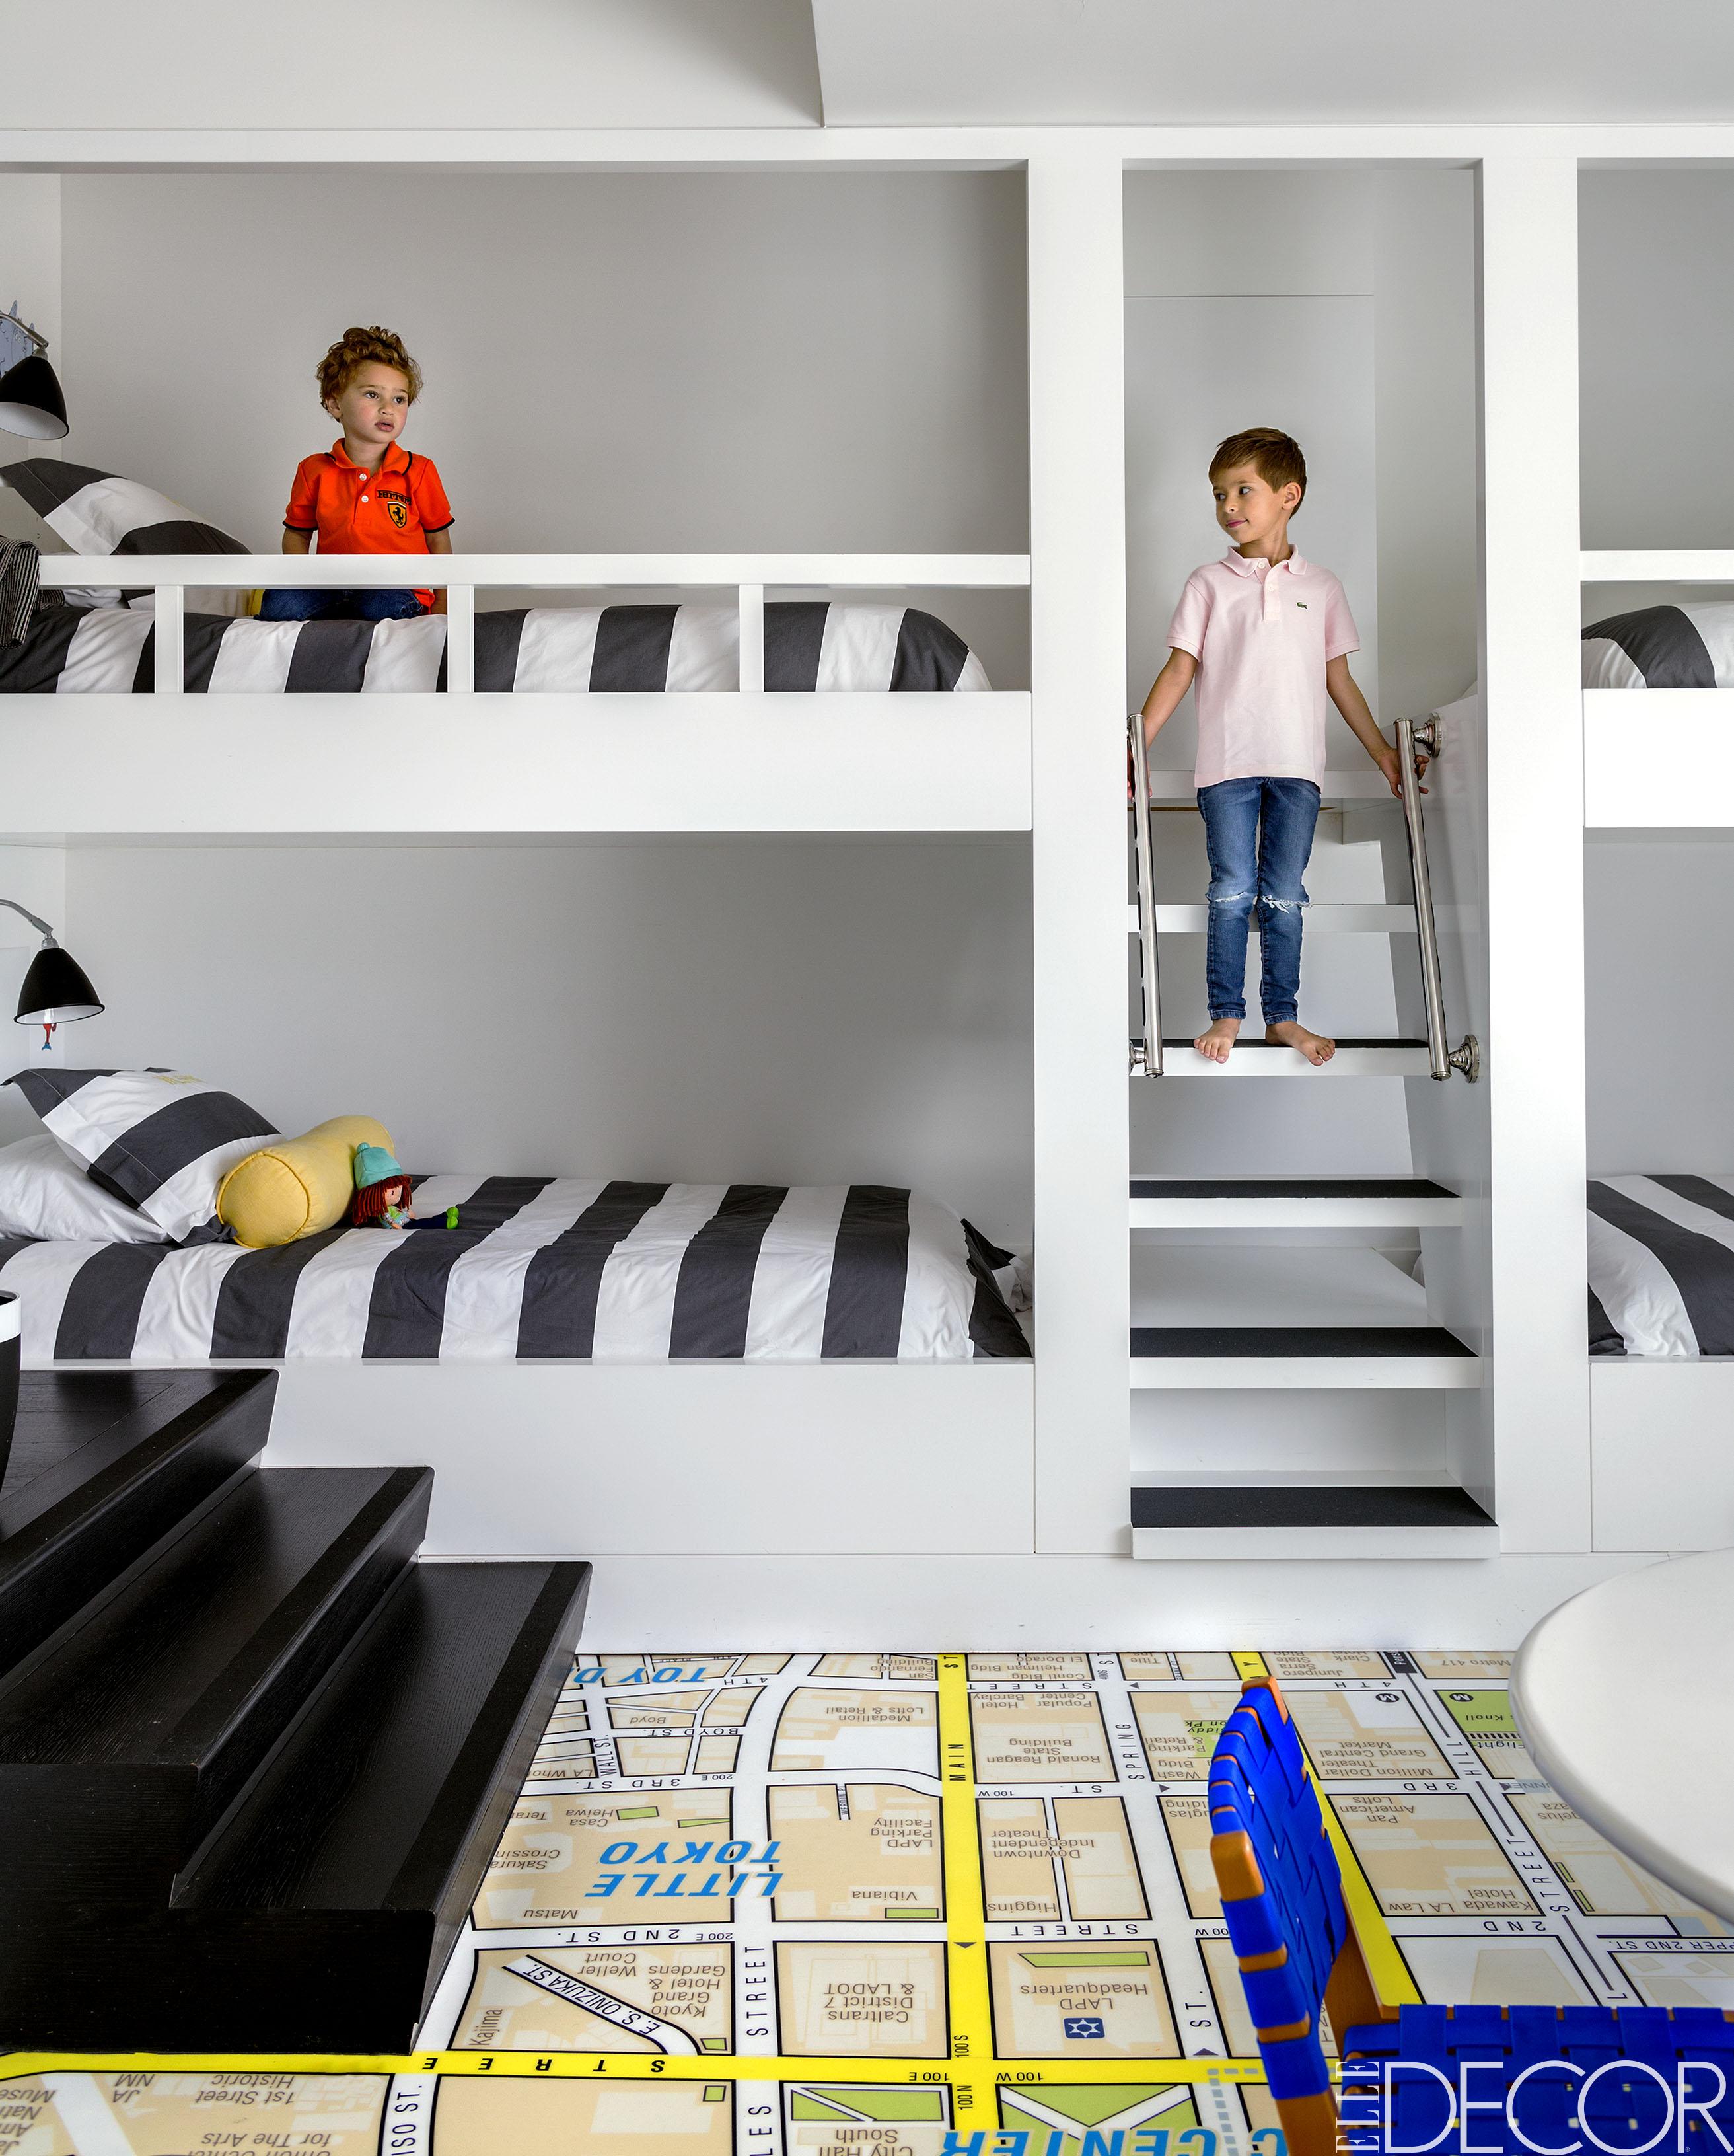 boys rooms 15 cool boys bedroom ideas - decorating a little boy room LLZZKNL